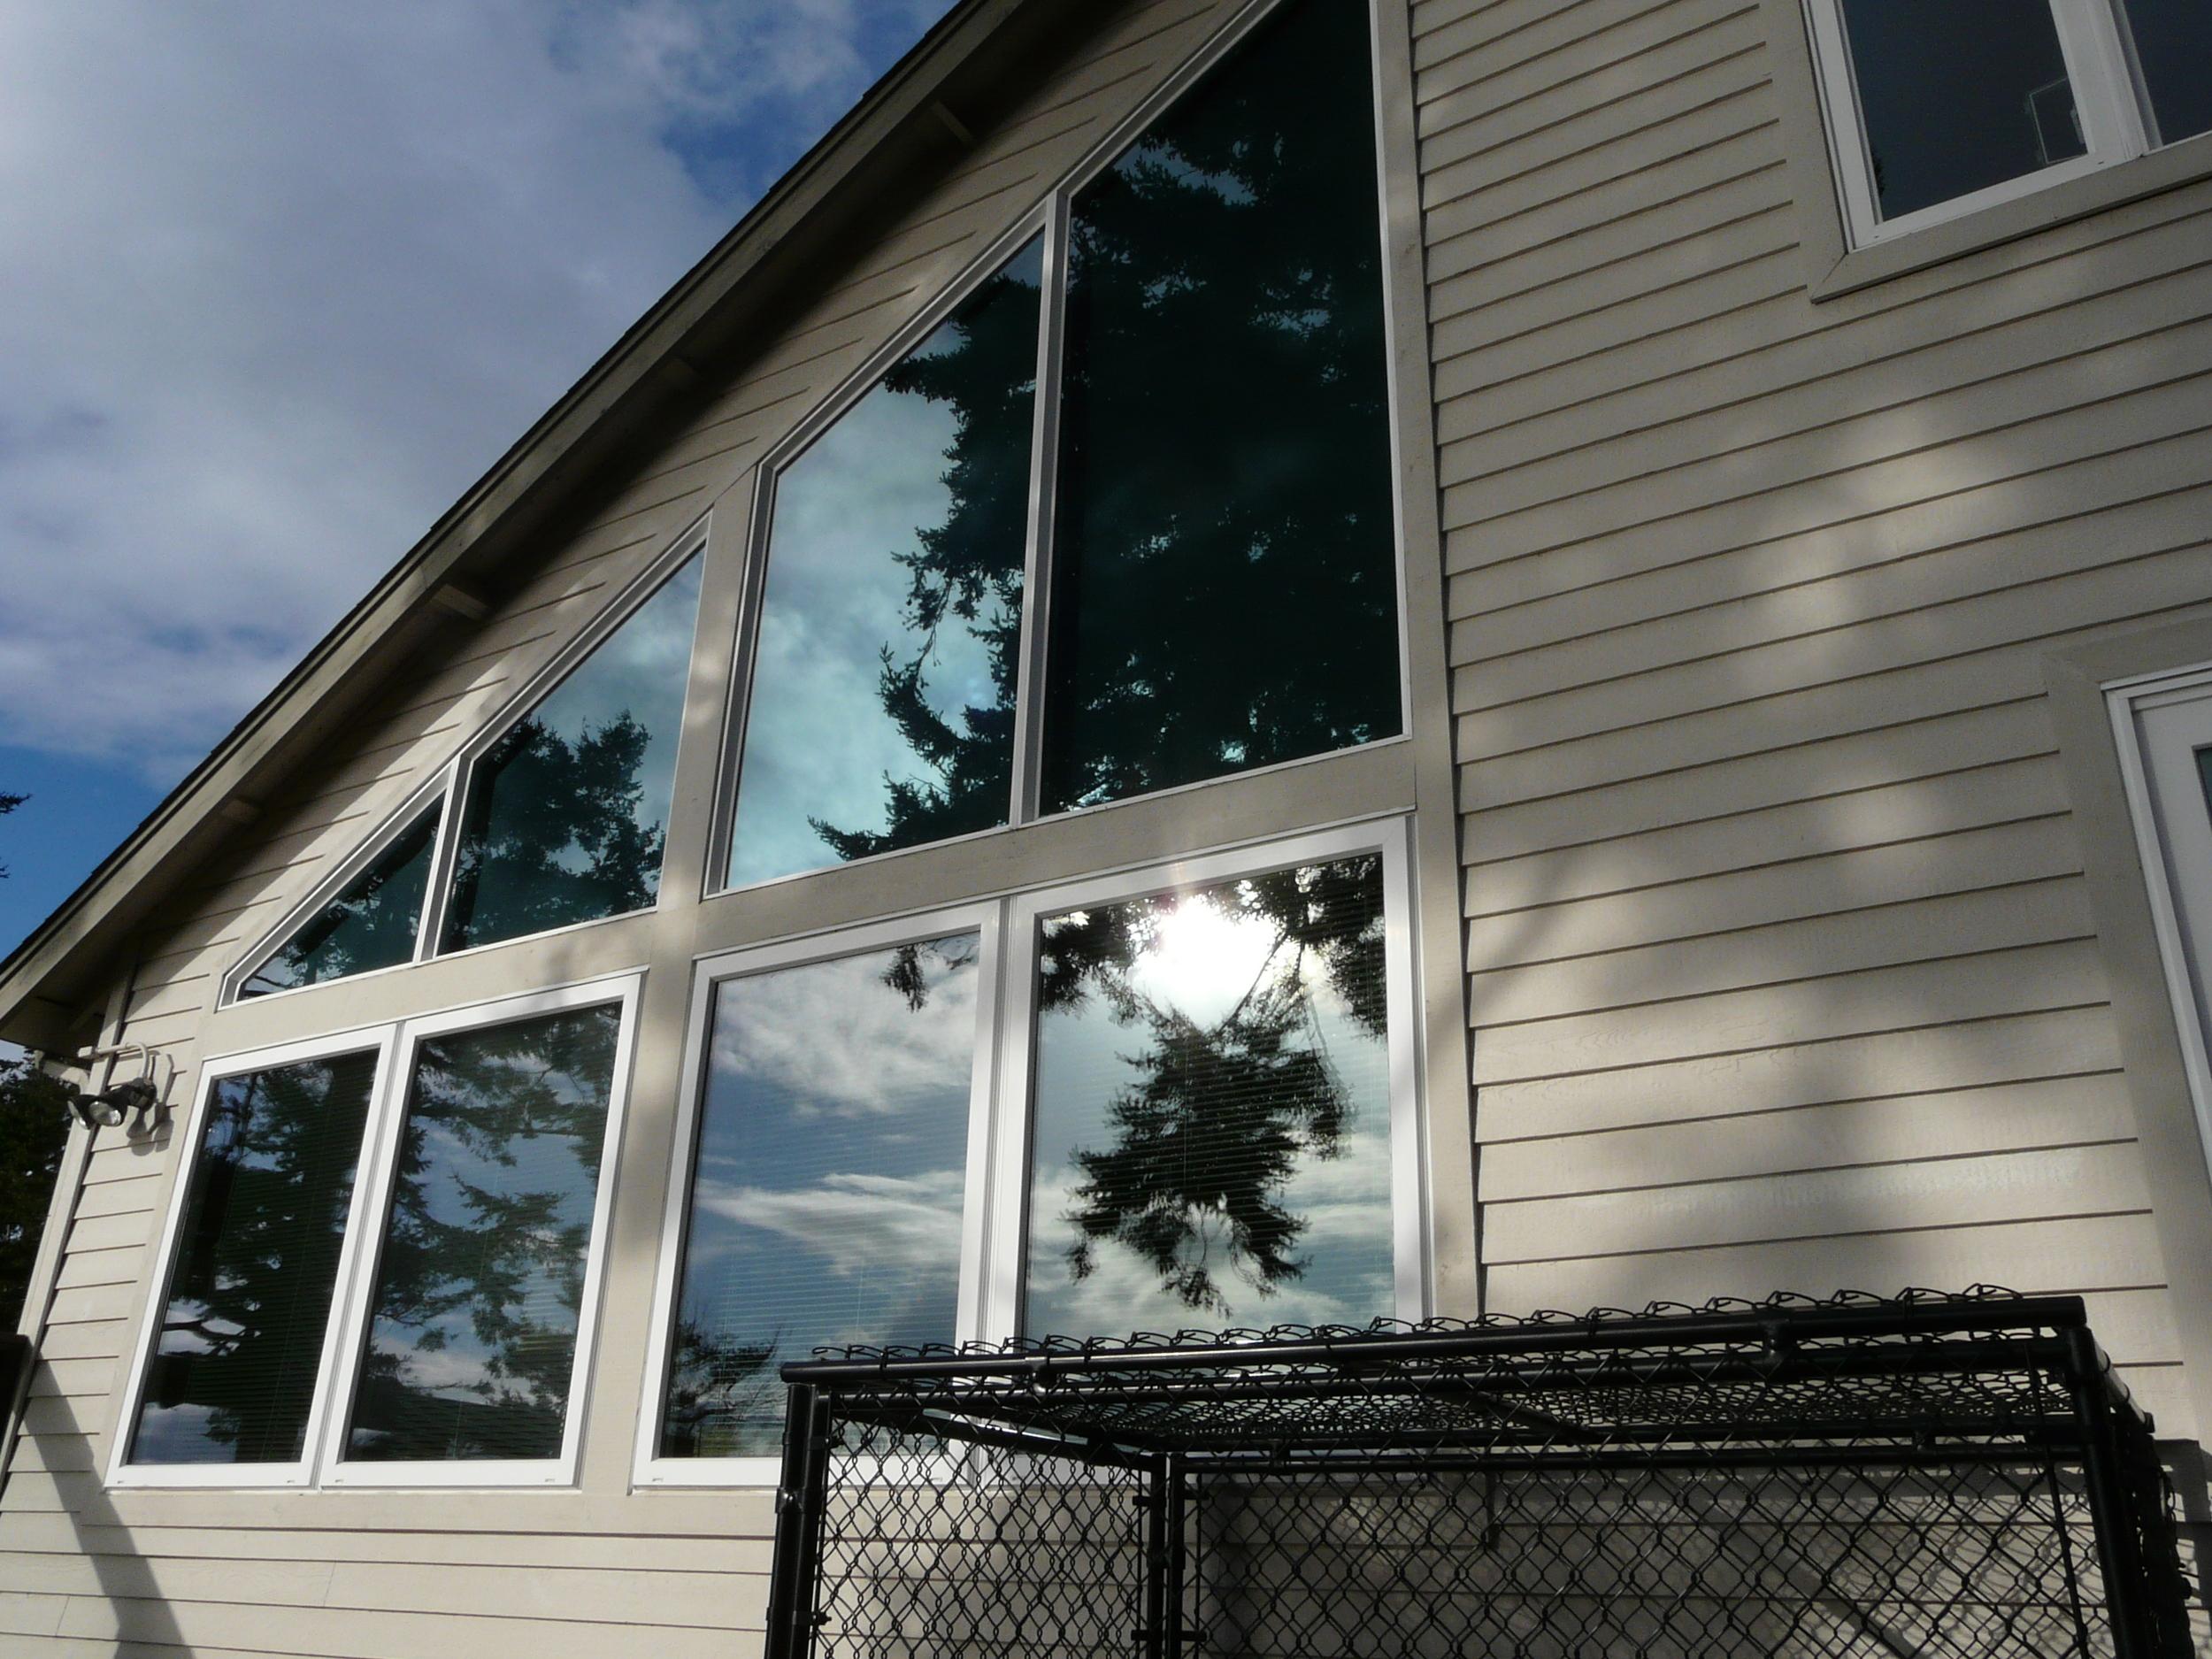 window replacement 1.jpeg